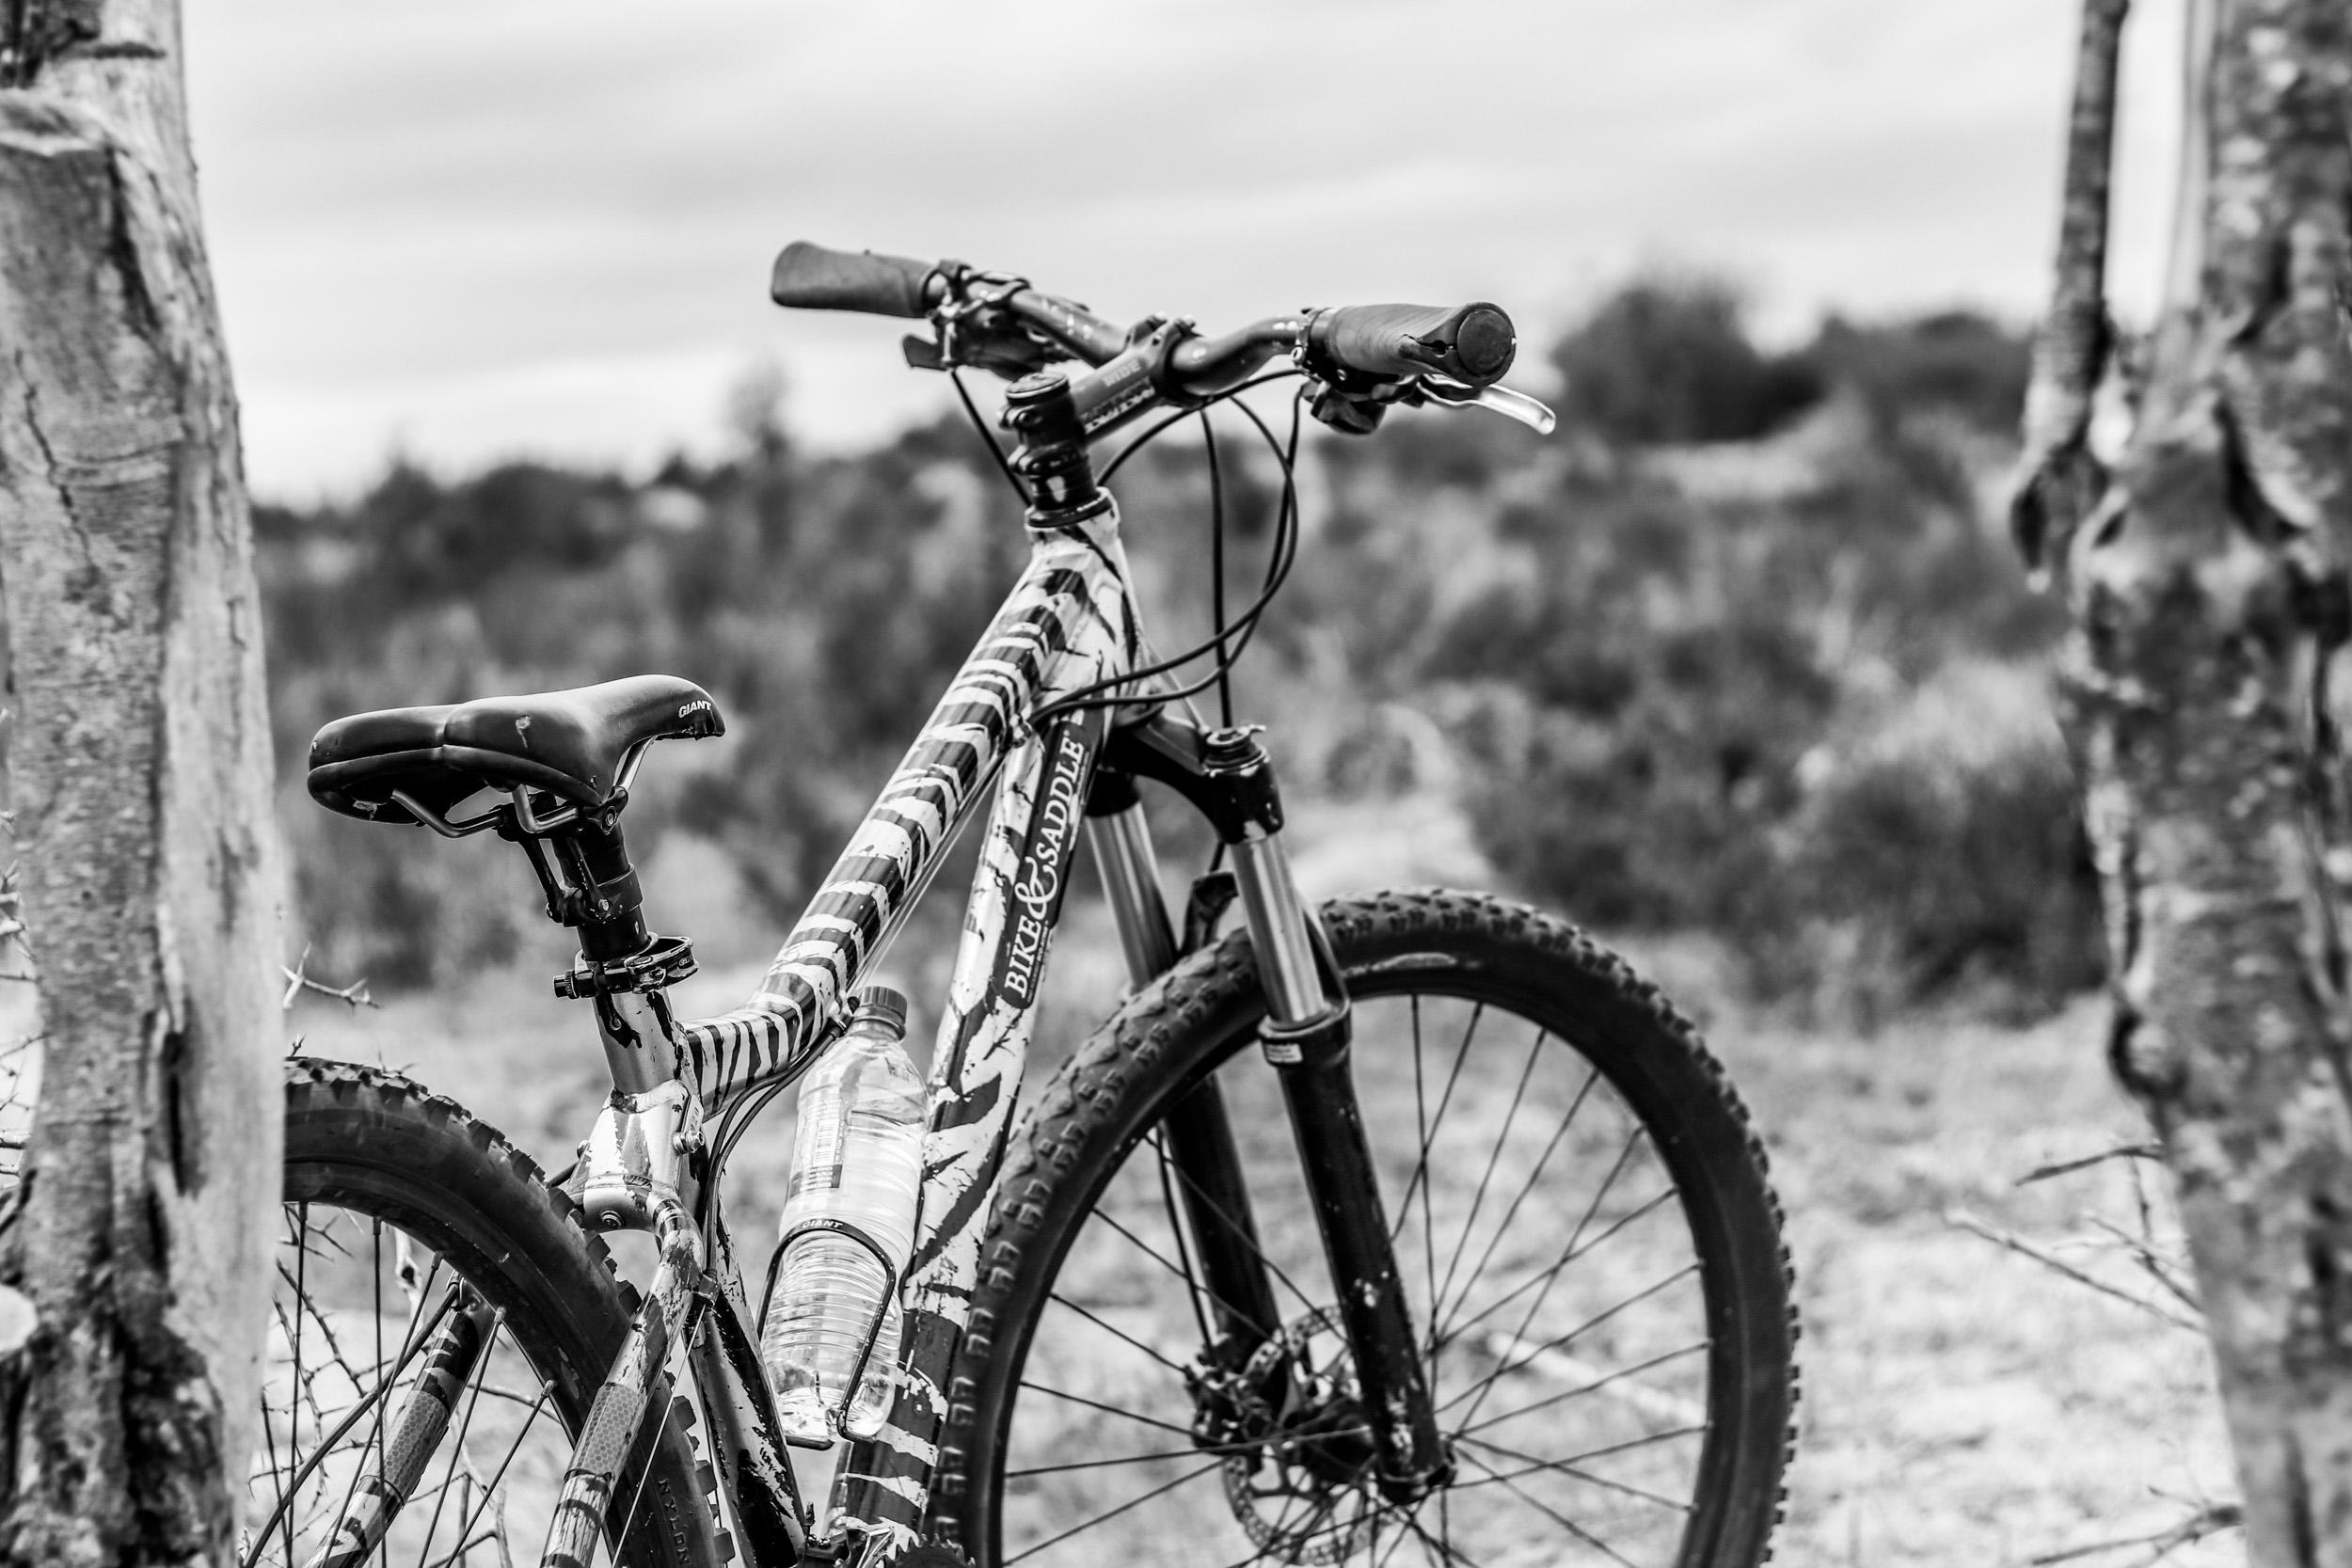 Bike and Saddle - 14 March 2018 (San Tour & West Coast National Park) - by Ken Treloar Photography (43)-2.JPG